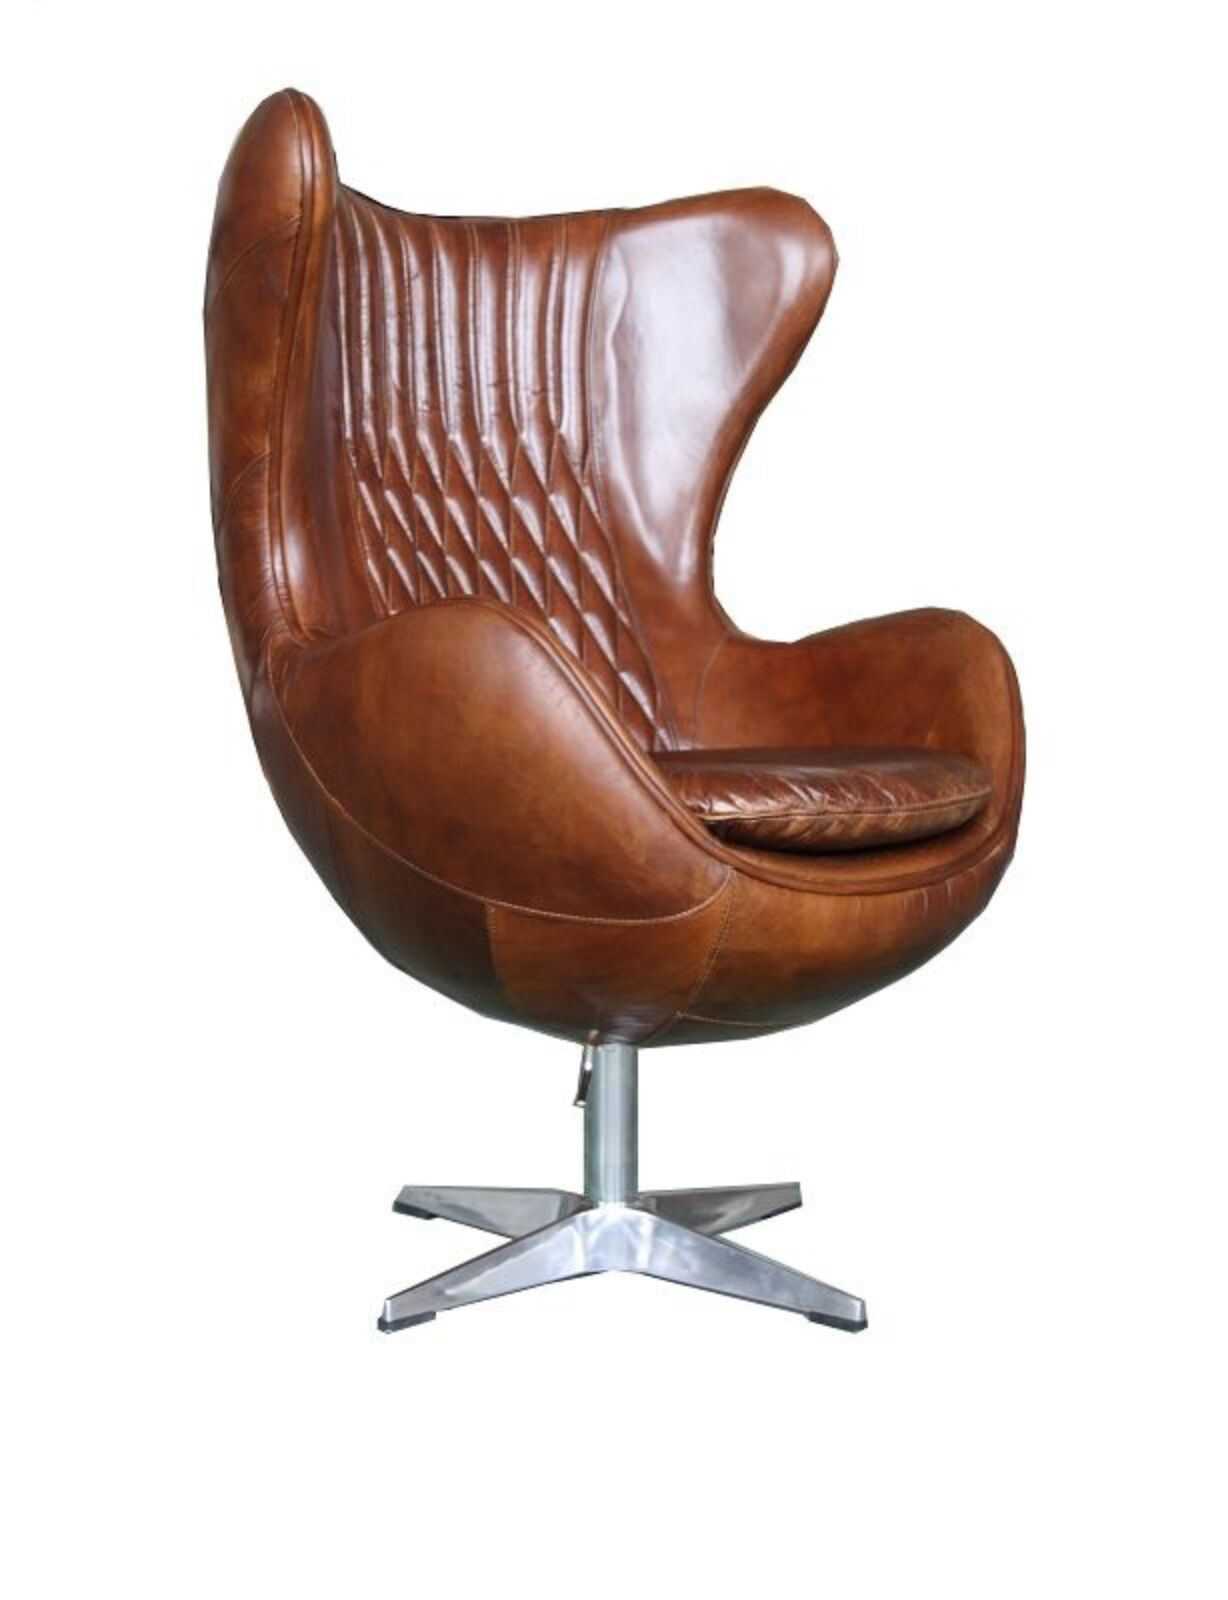 distressed leather armchair uk rocky mountain folding chairs aviator retro swivel egg vintage